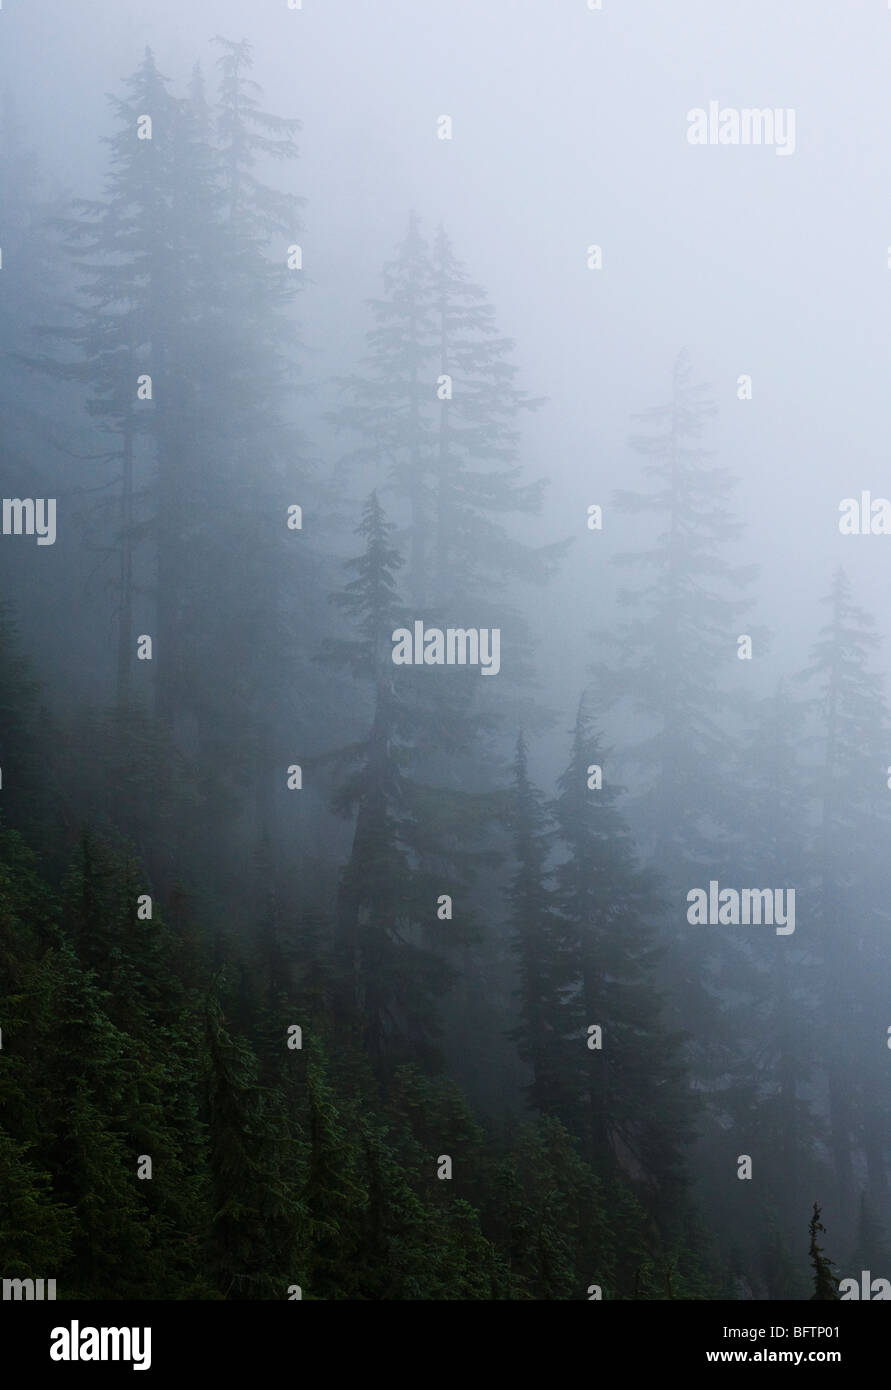 Trees in the fog near Snoqualmie Pass, Washington, USA. - Stock Image